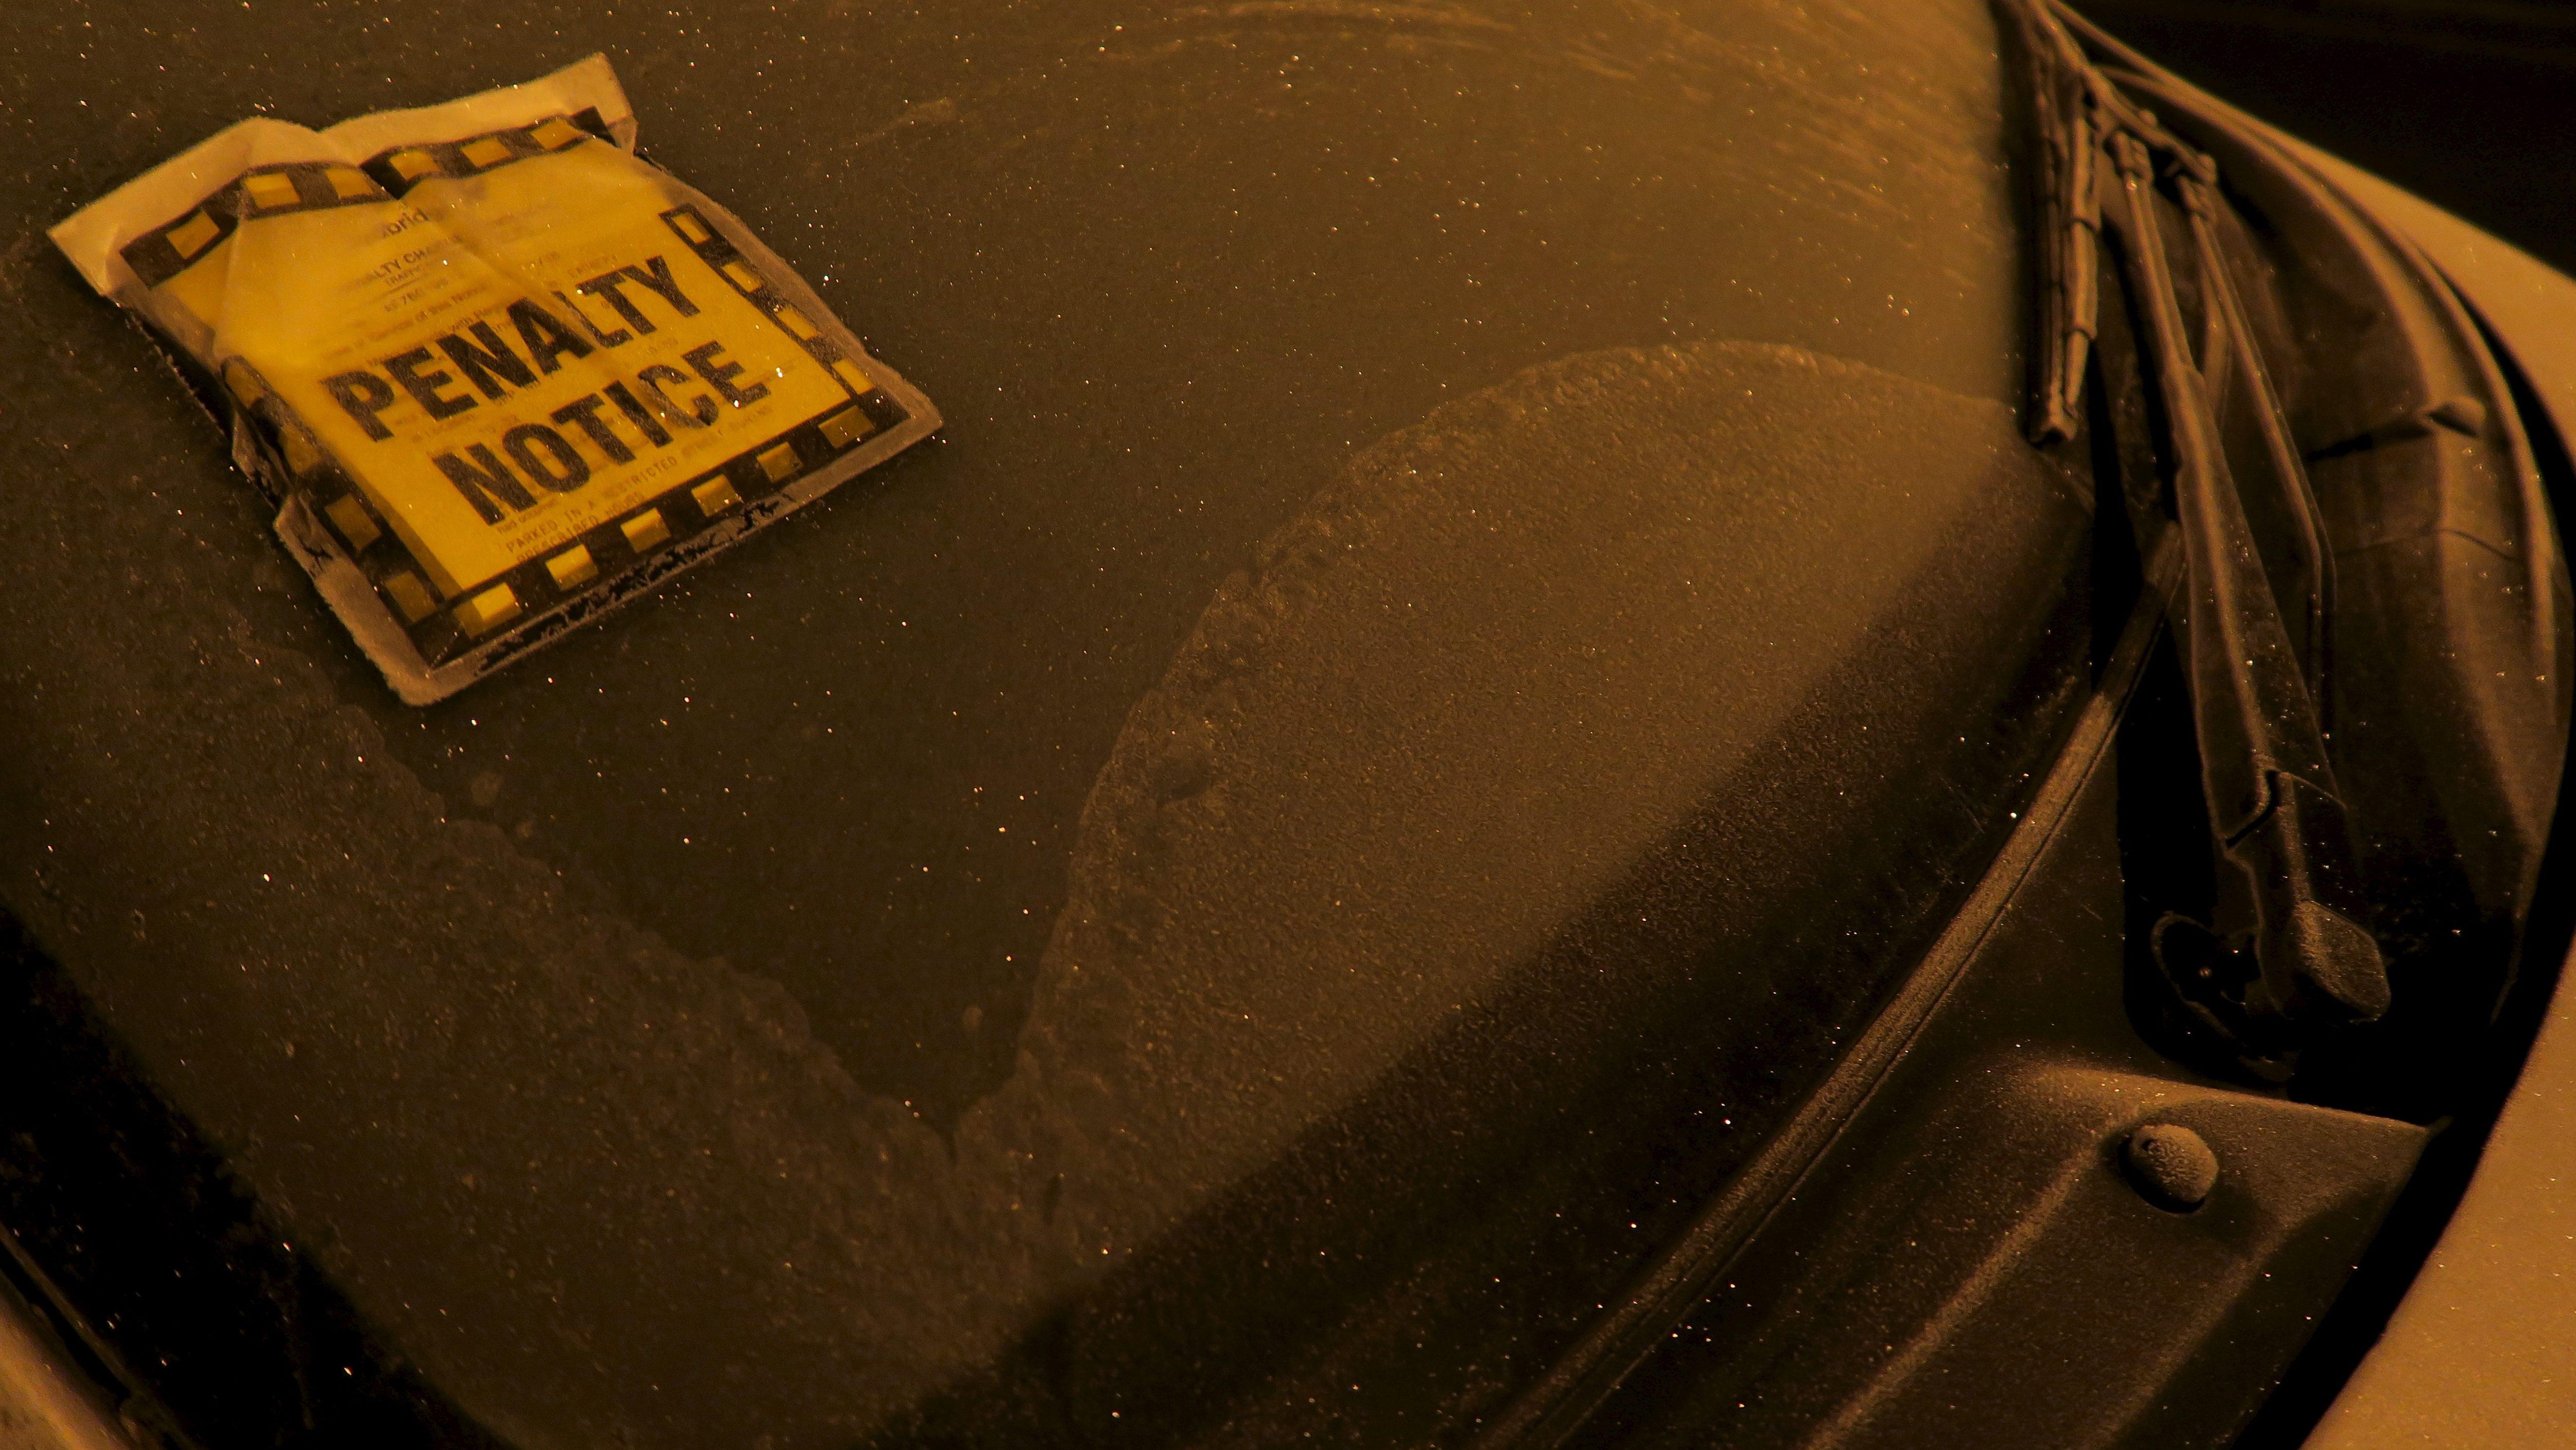 A parking fine ticket